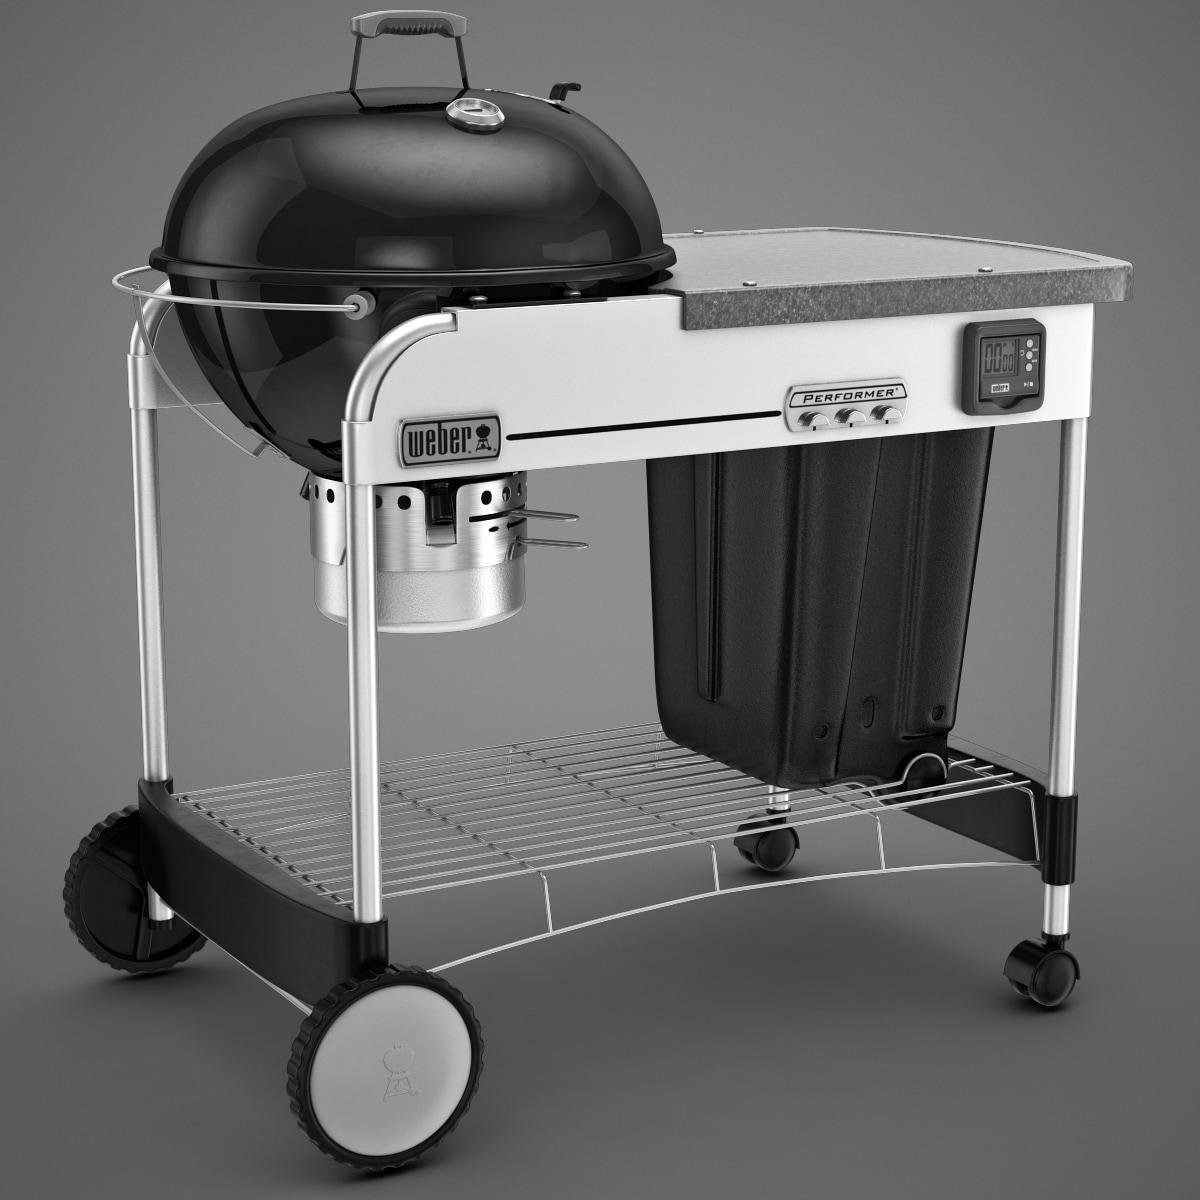 weber grill charcoal gbs 3d model. Black Bedroom Furniture Sets. Home Design Ideas